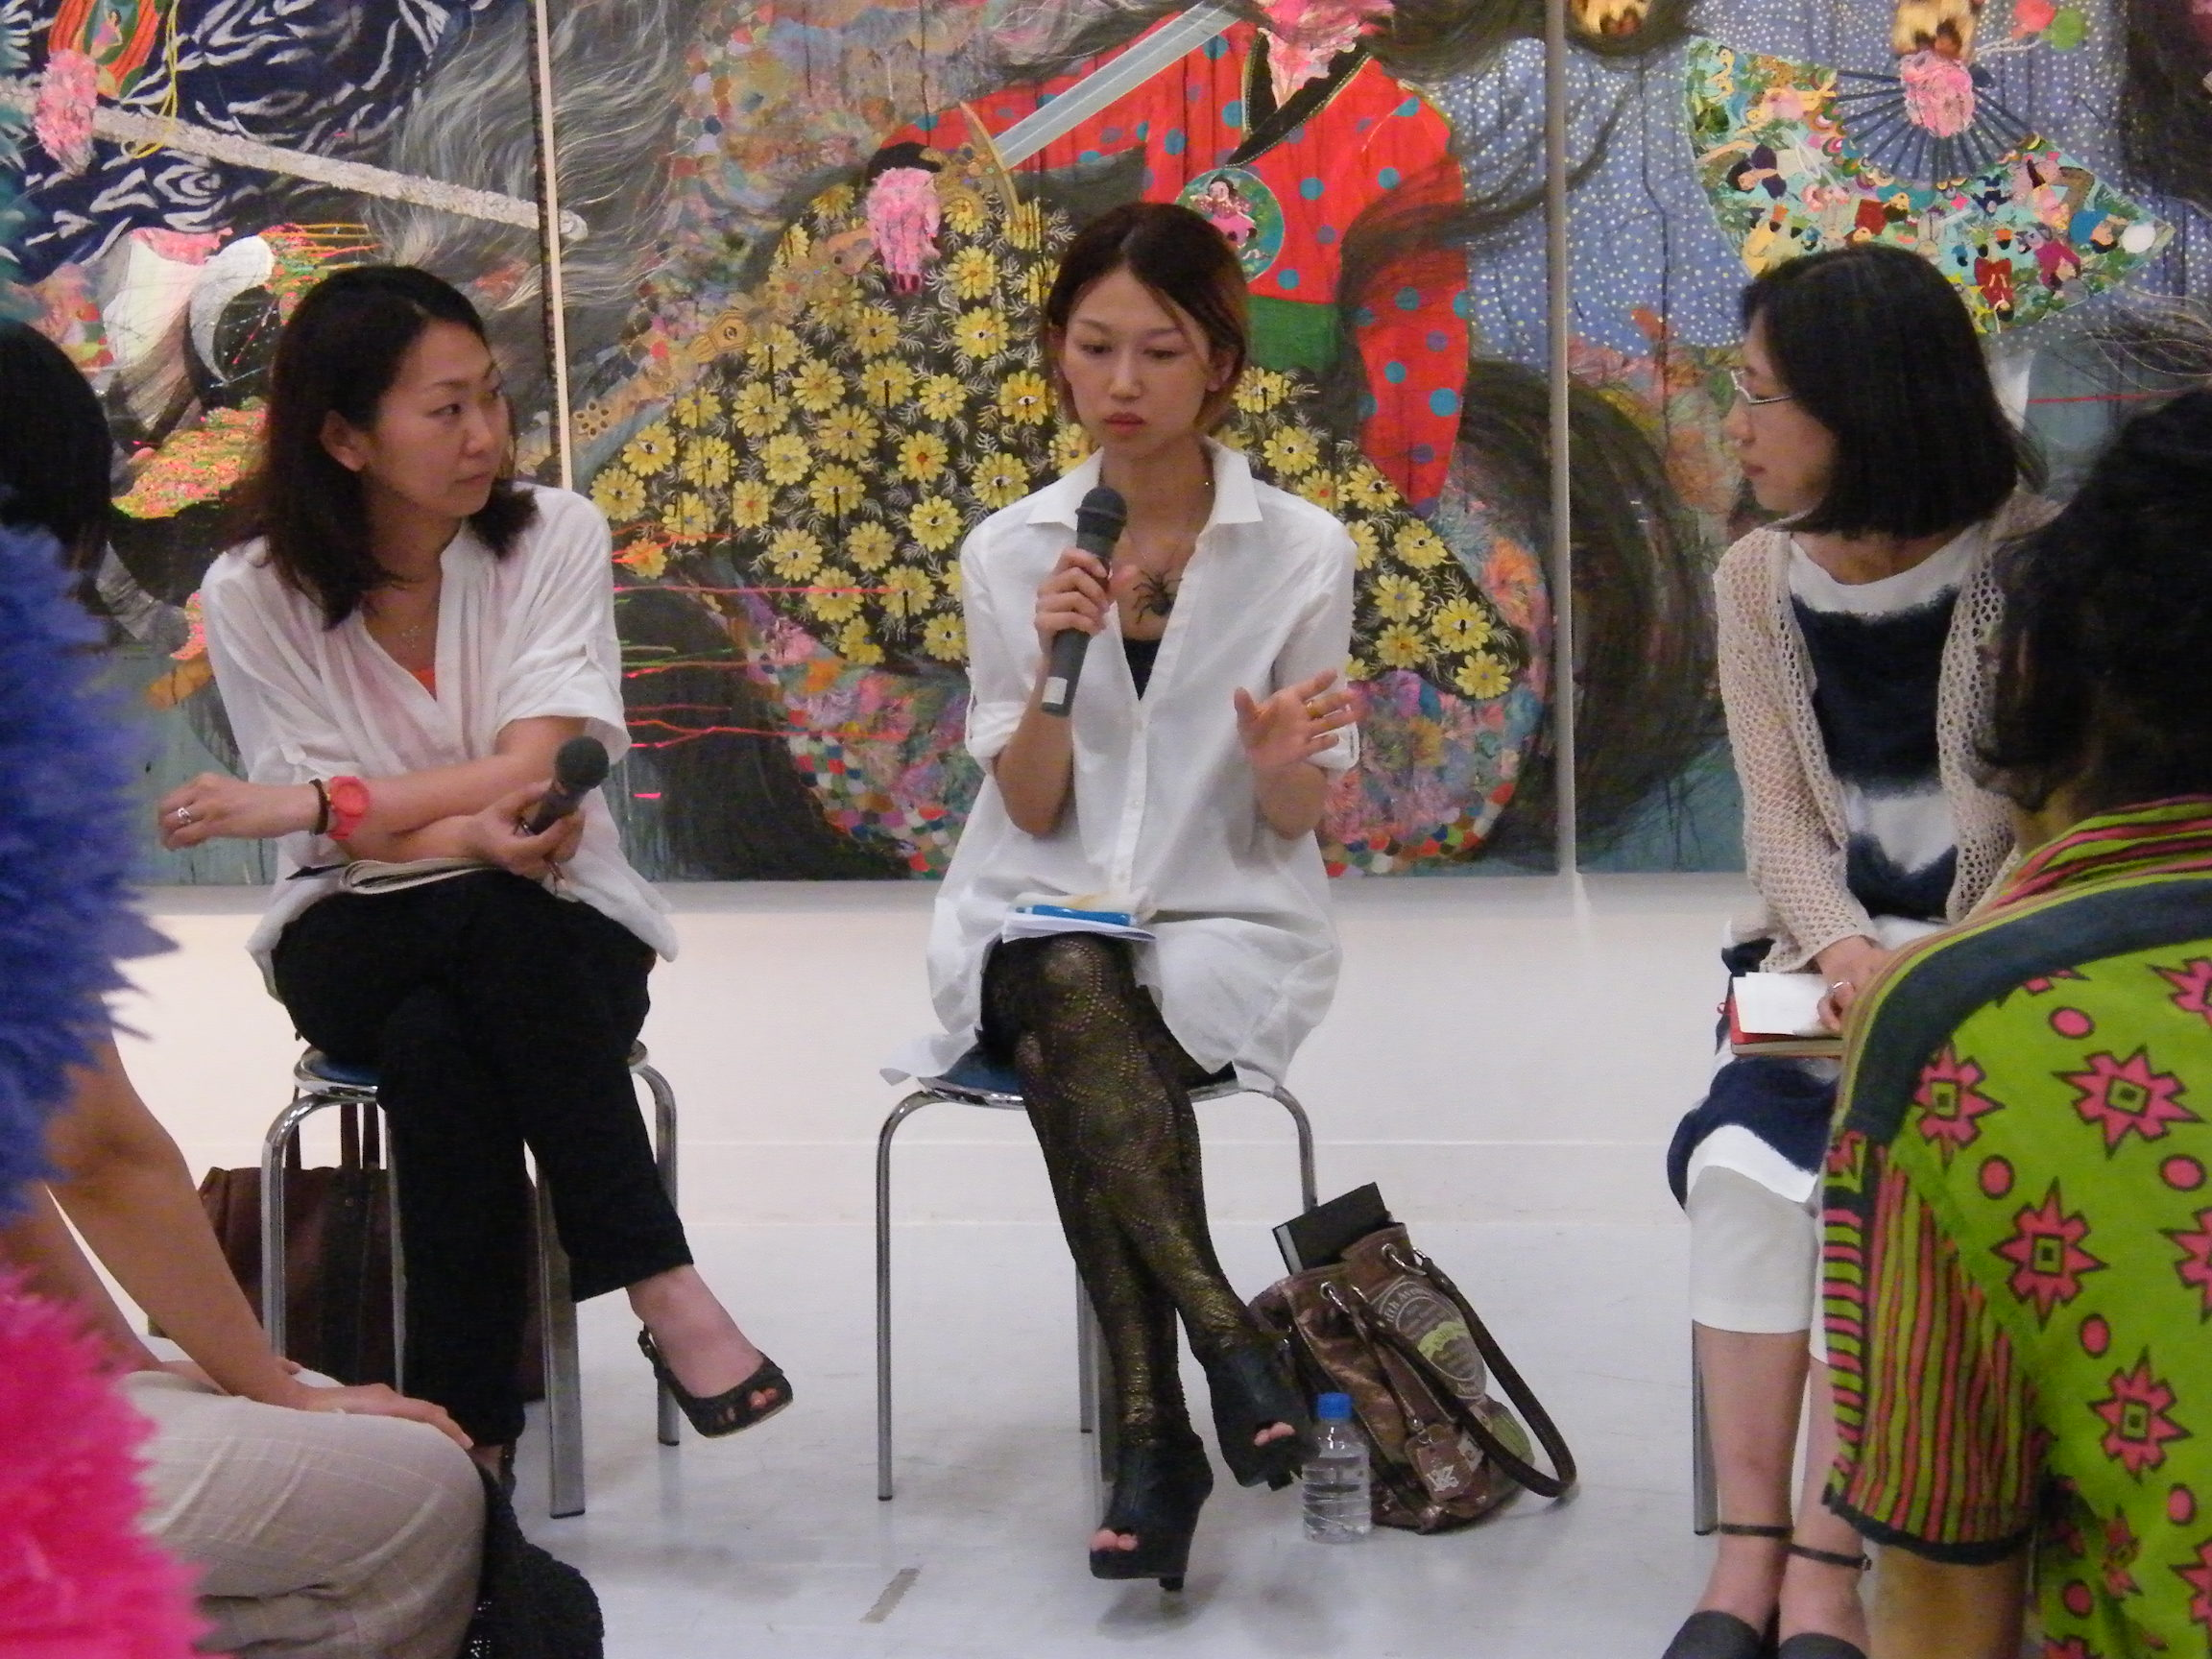 newincubation3 「On a Knife Edge—二つの向こう岸」<br /> dialogue 「Hyon Gyon×呉夏枝(artist)」 25th 11 2011